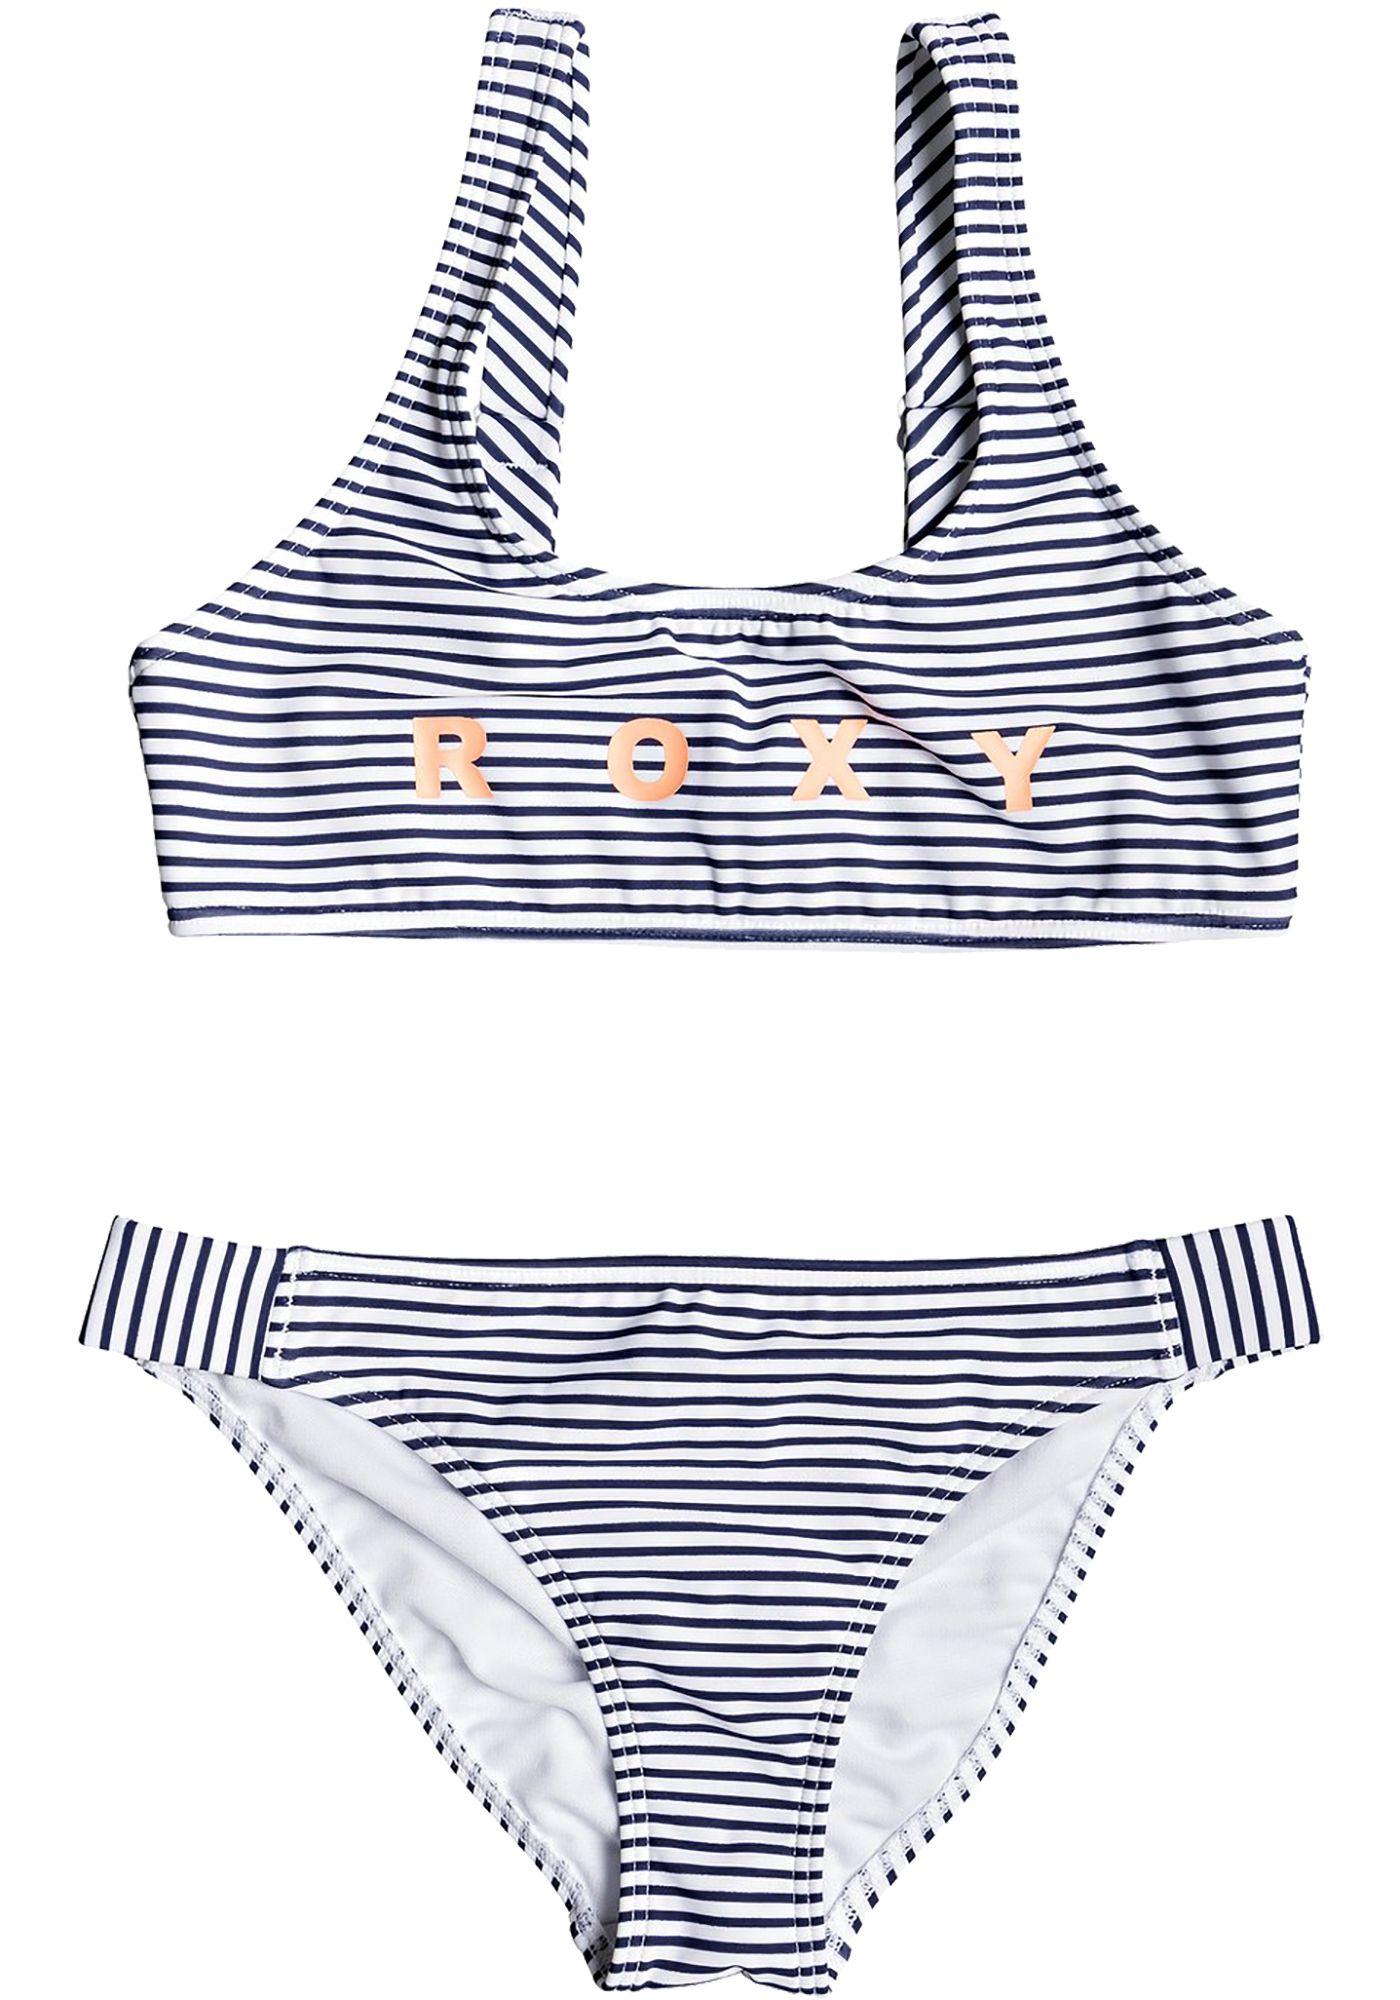 Roxy Girls' Surfing Free Sports Bra Bikini Set